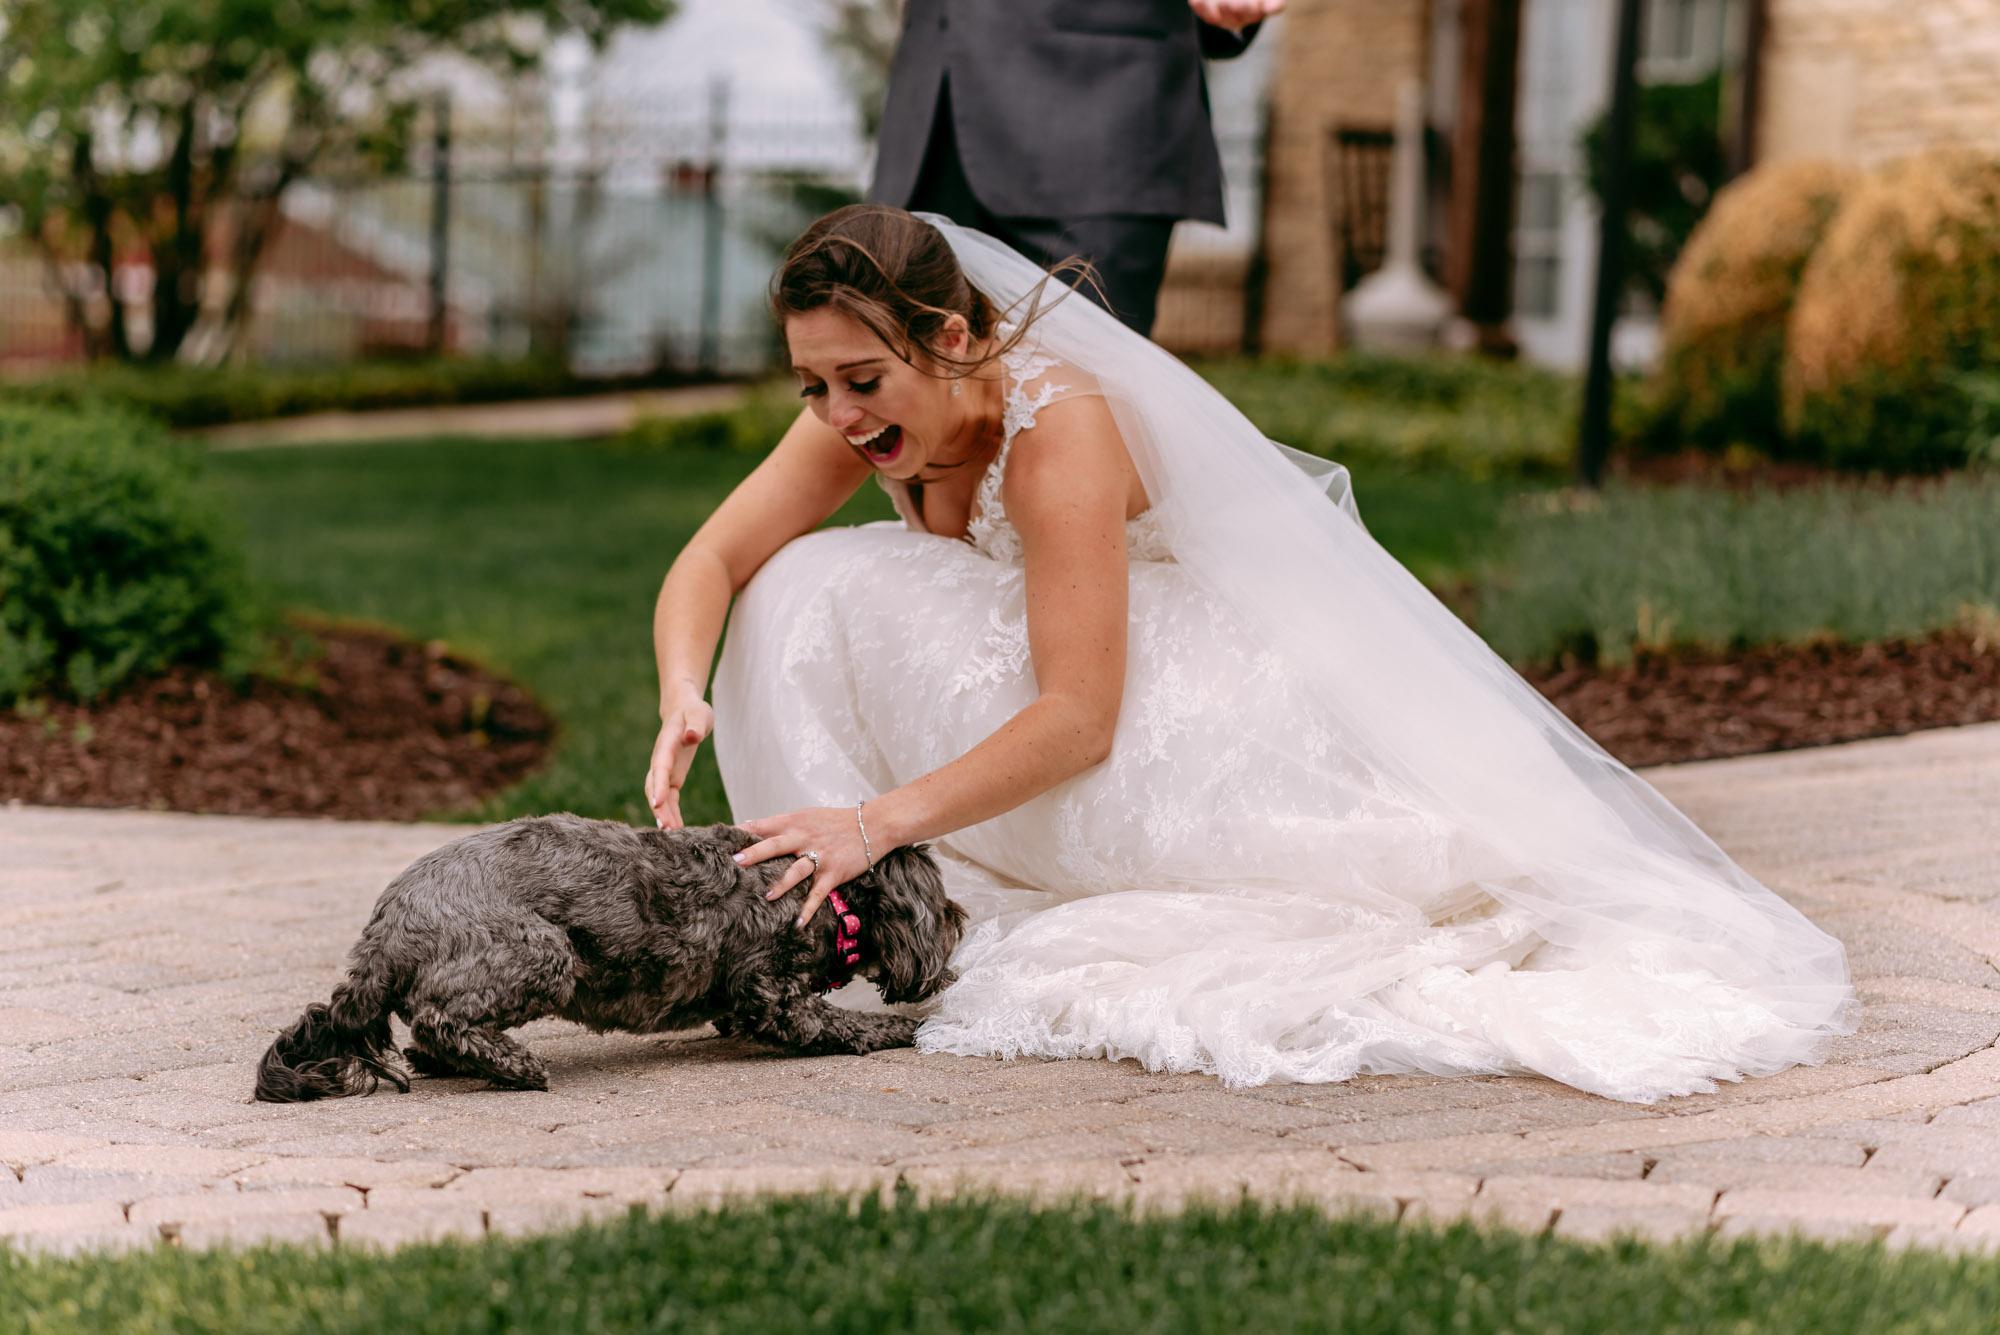 orchard-farms-pavillion-wedding-rockton-IL-wedding-photographers-214.jpg